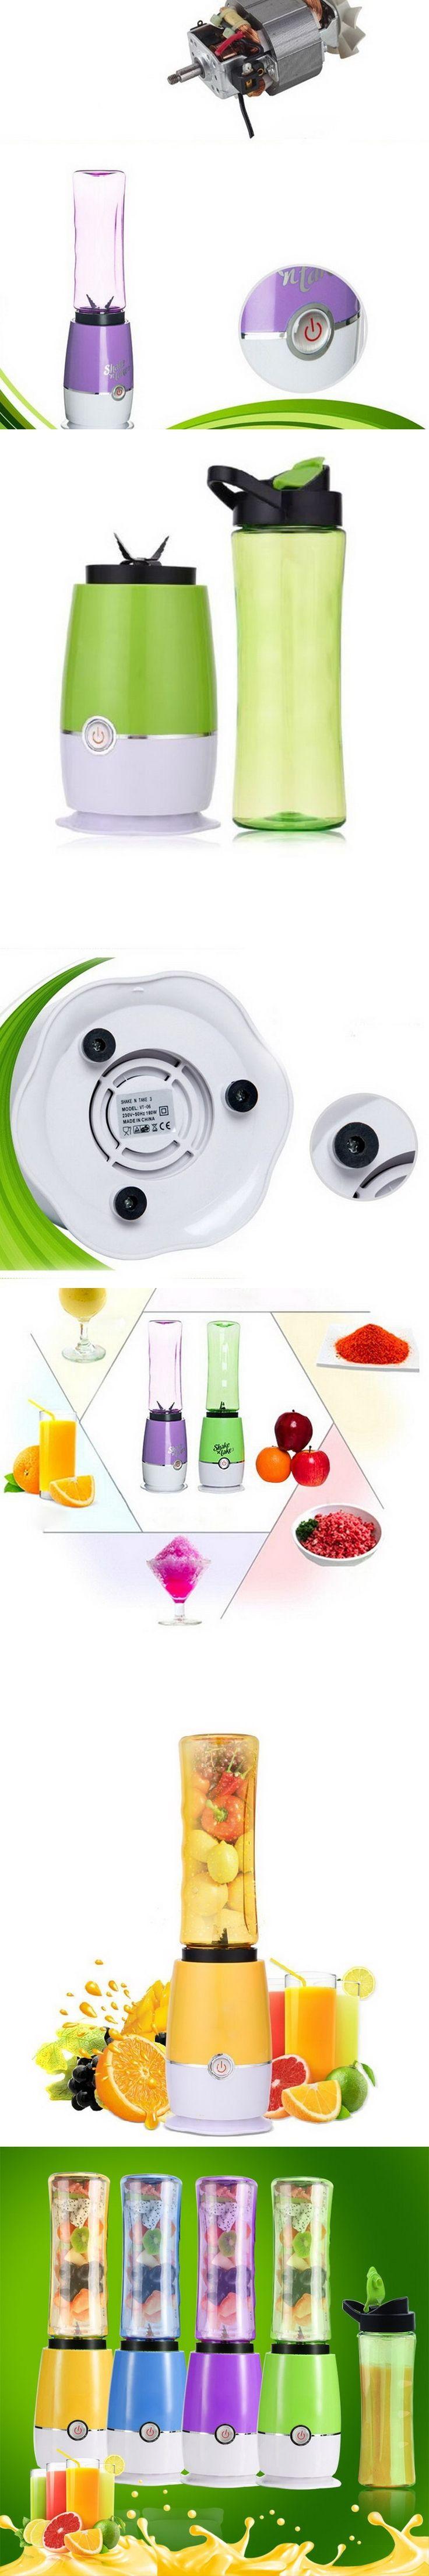 Electric Lemon Jucier Mini Portable Rechargeable Electric Fruit Juicer Smoothie Maker Blender